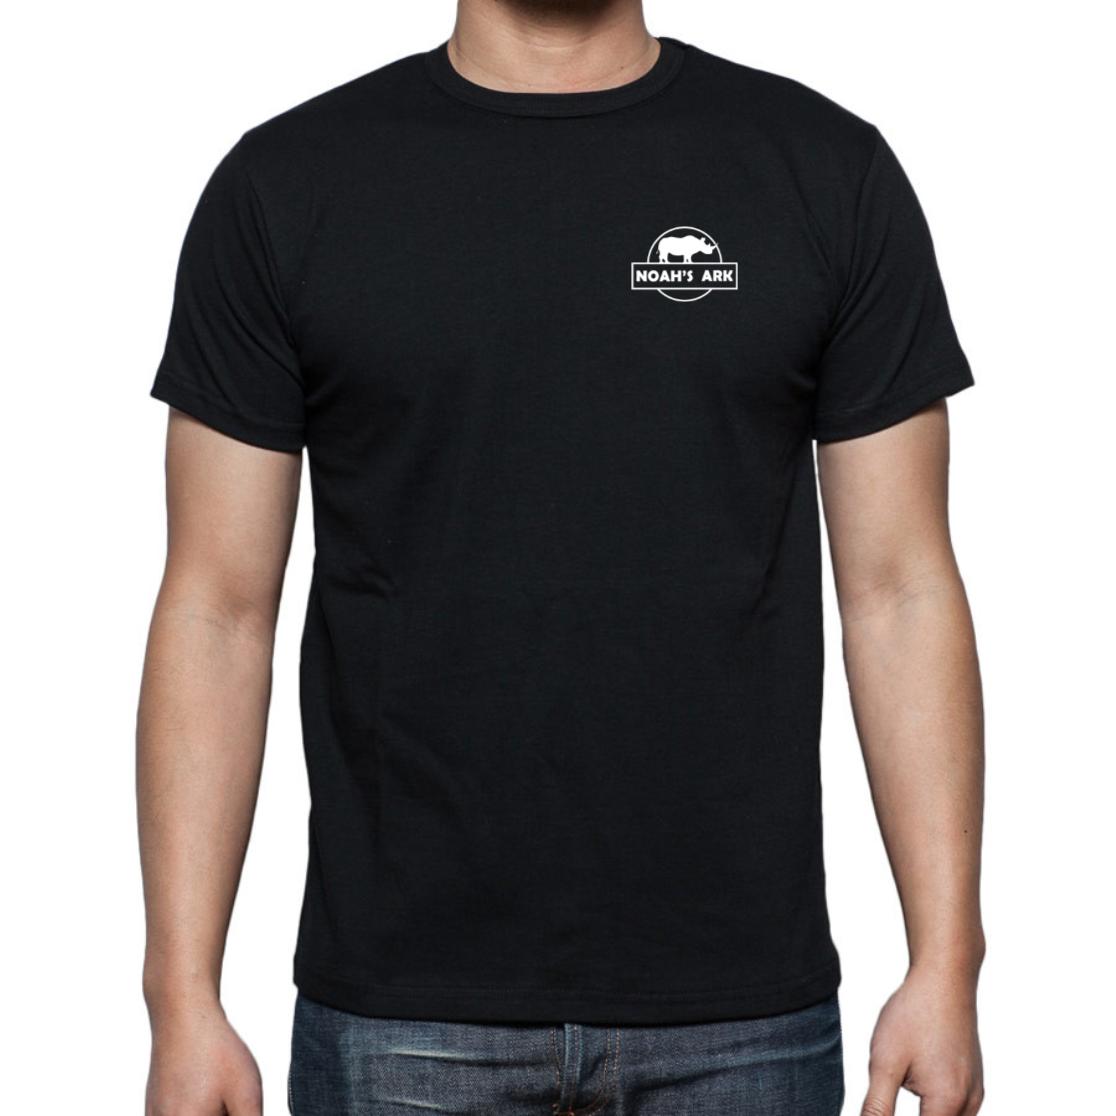 97e50c3c7 Branded Noah's Ark T-Shirt | Noah's Ark